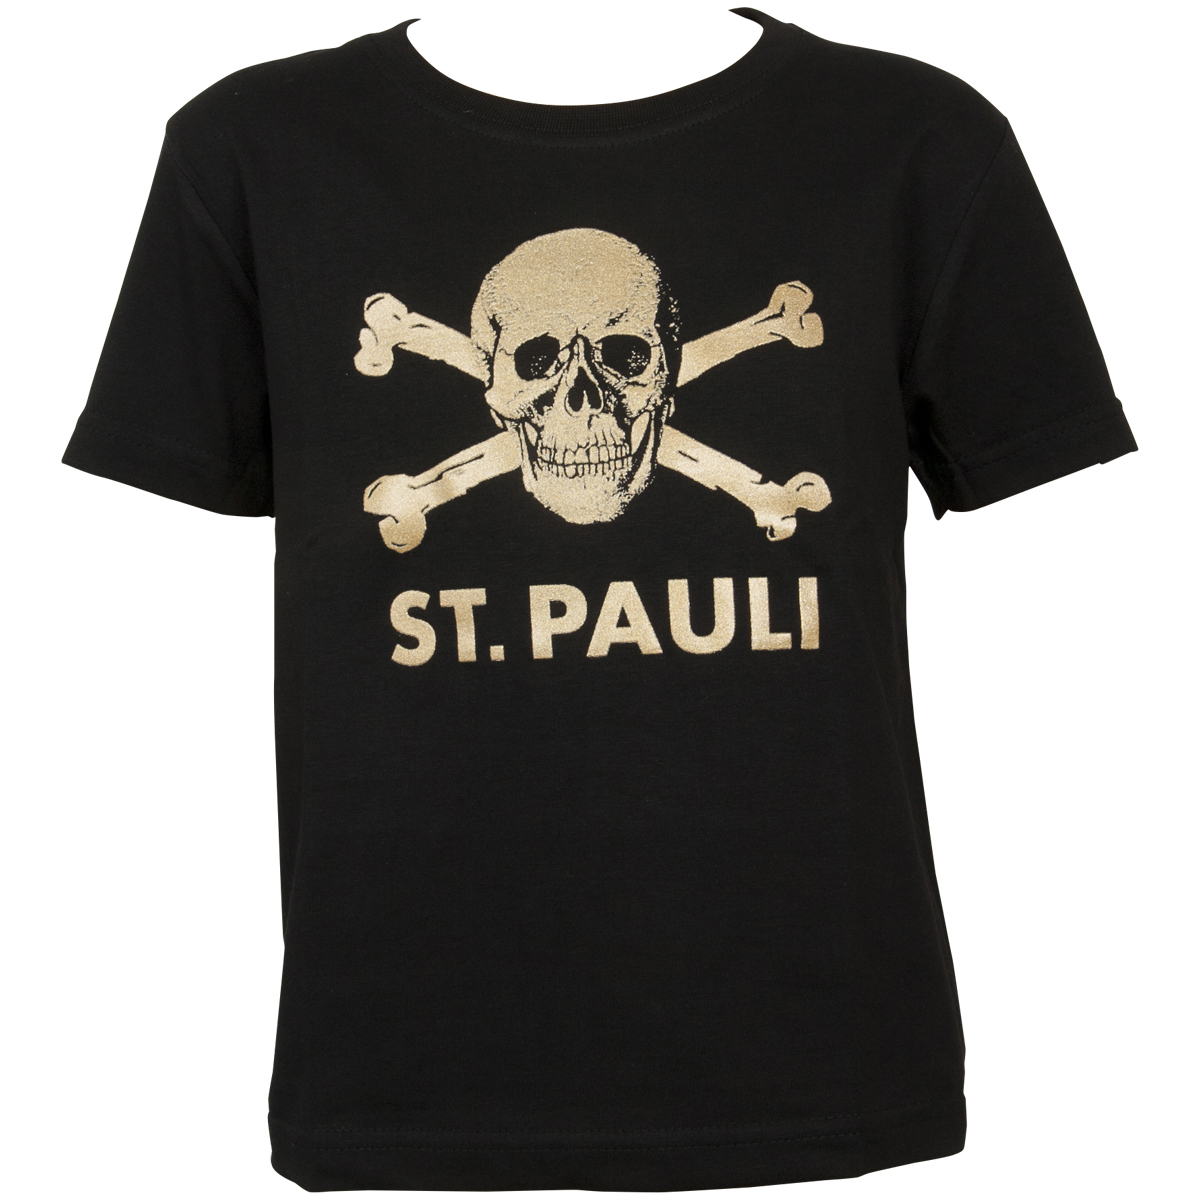 FC St. Pauli - Kinder T-Shirt Schwarz-Gold